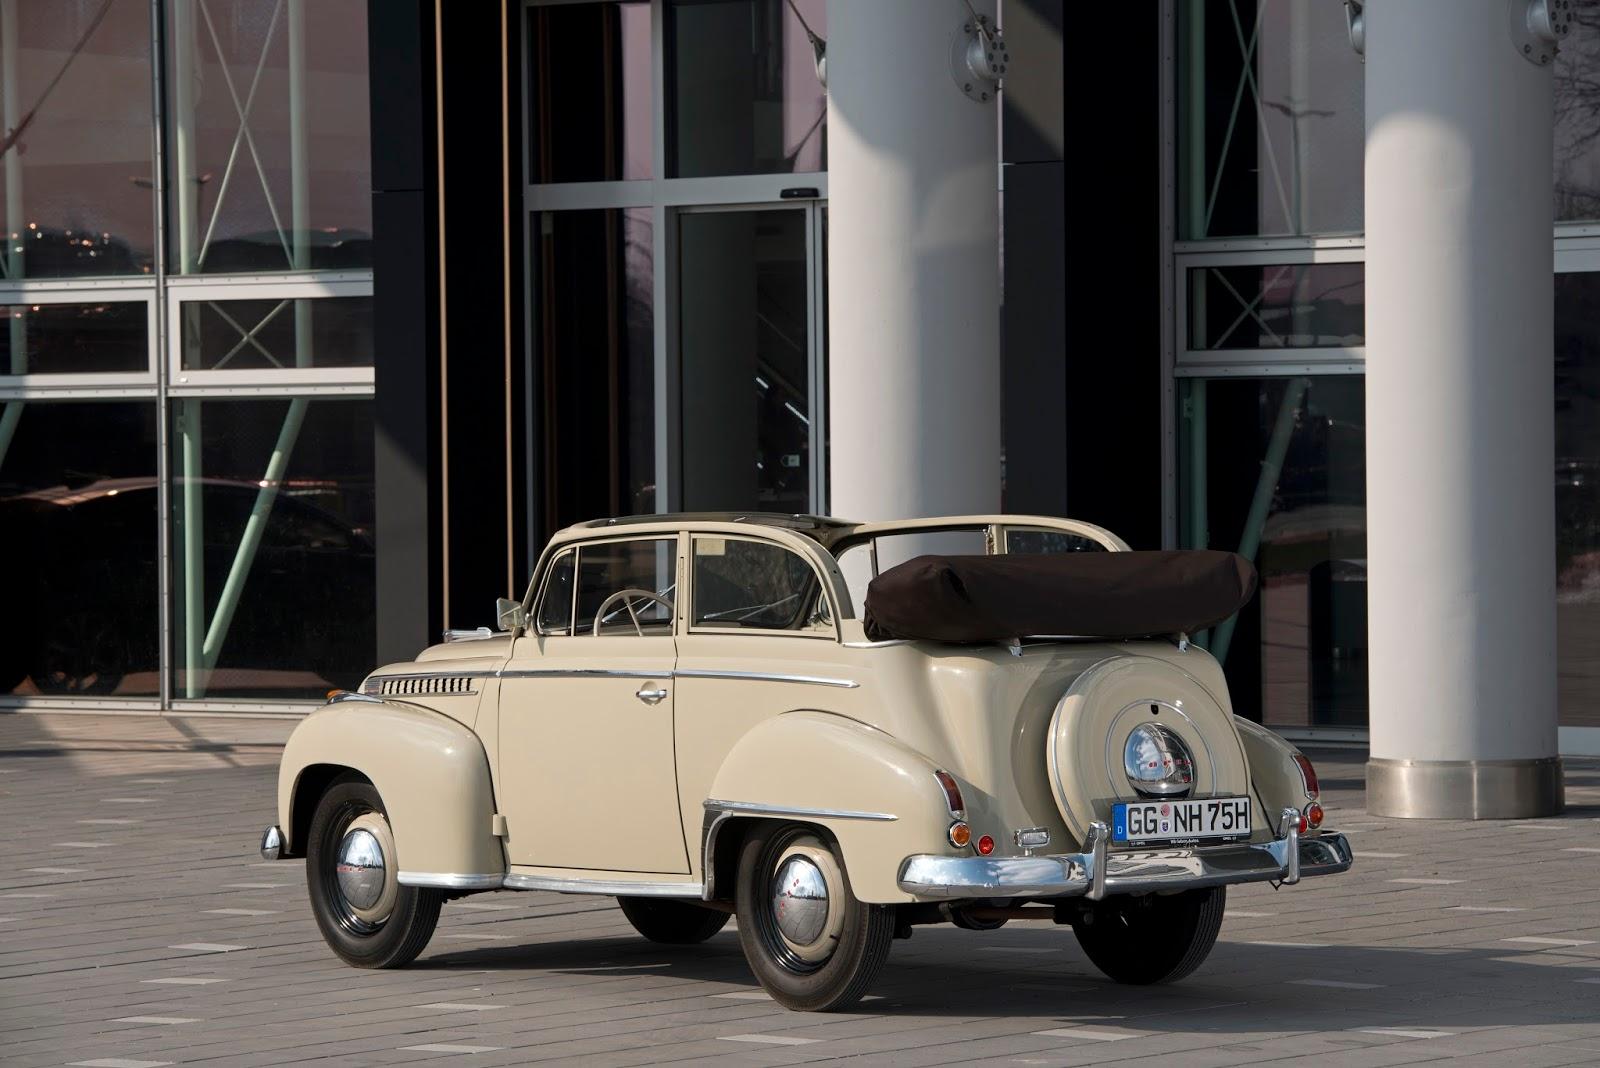 Opel Rallye Hessen Th25C325BCringen 301764 H Πλούσια Κληρονομιά των Opel Cabrio cabrio, Opel, Opel 8/25 hp, Opel Cascada, Opel Olympia, Opel Record, Opel Super 6